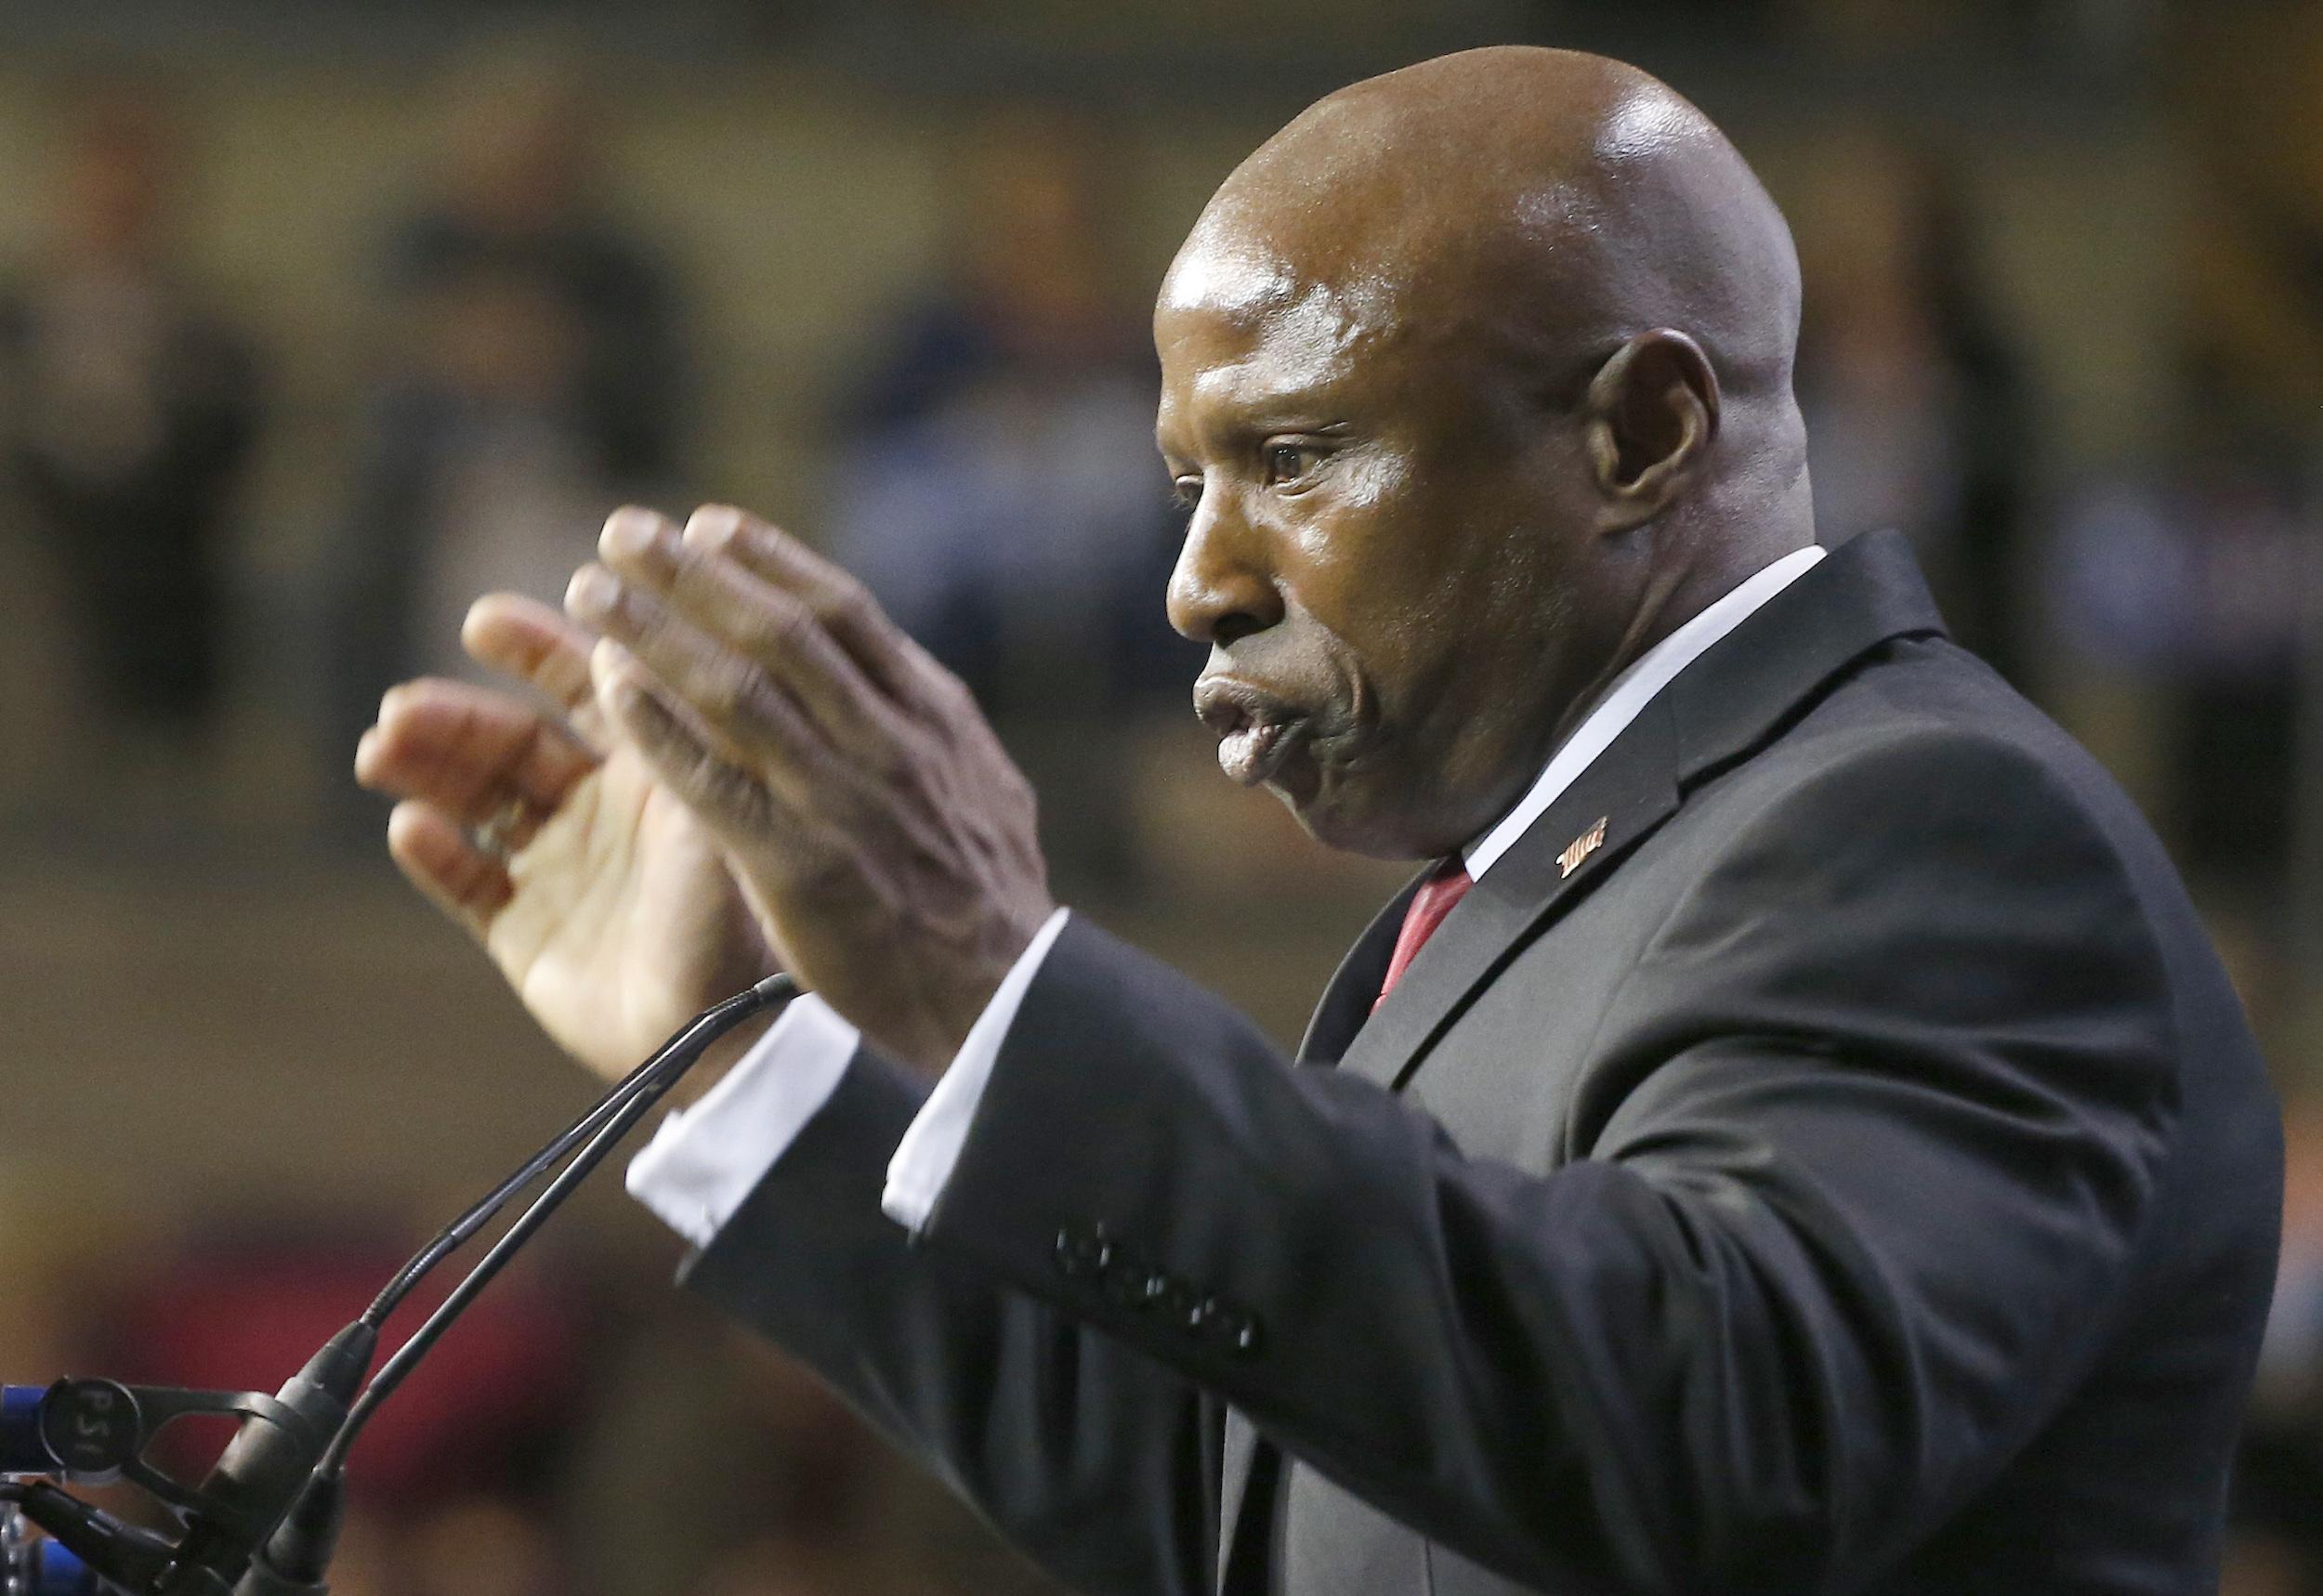 Photo: Darryl Glenn Gesturing (AP/File)